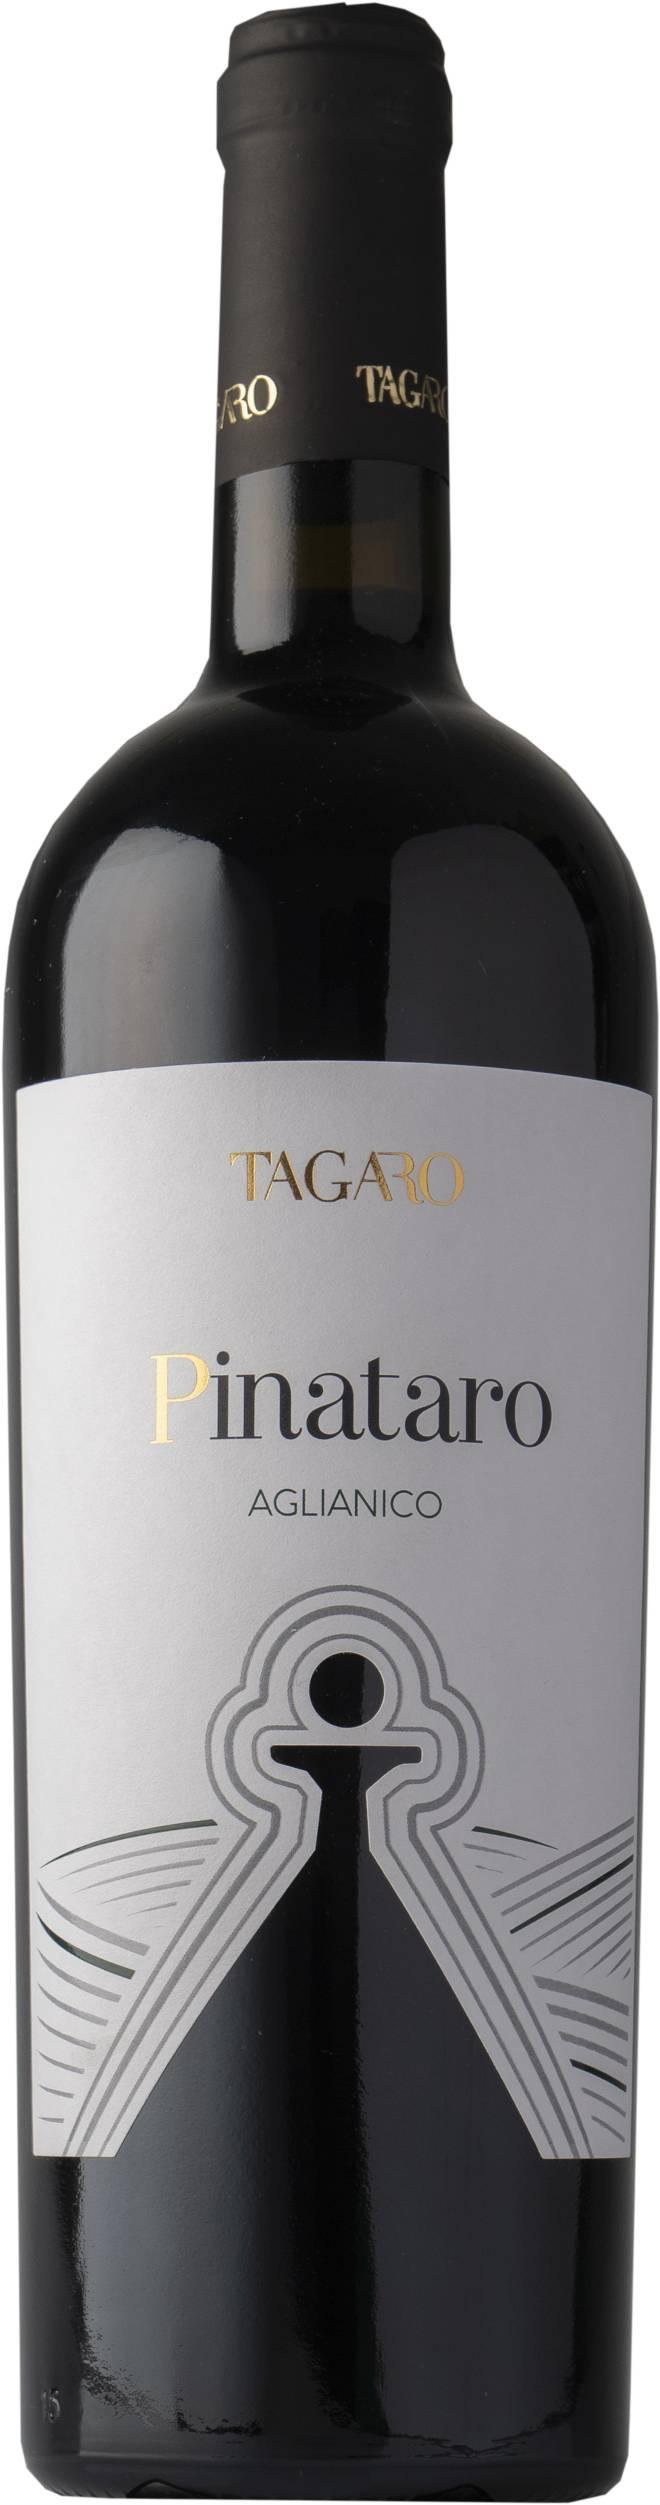 Tagaro - Aglianico Pinataro IGT 2018